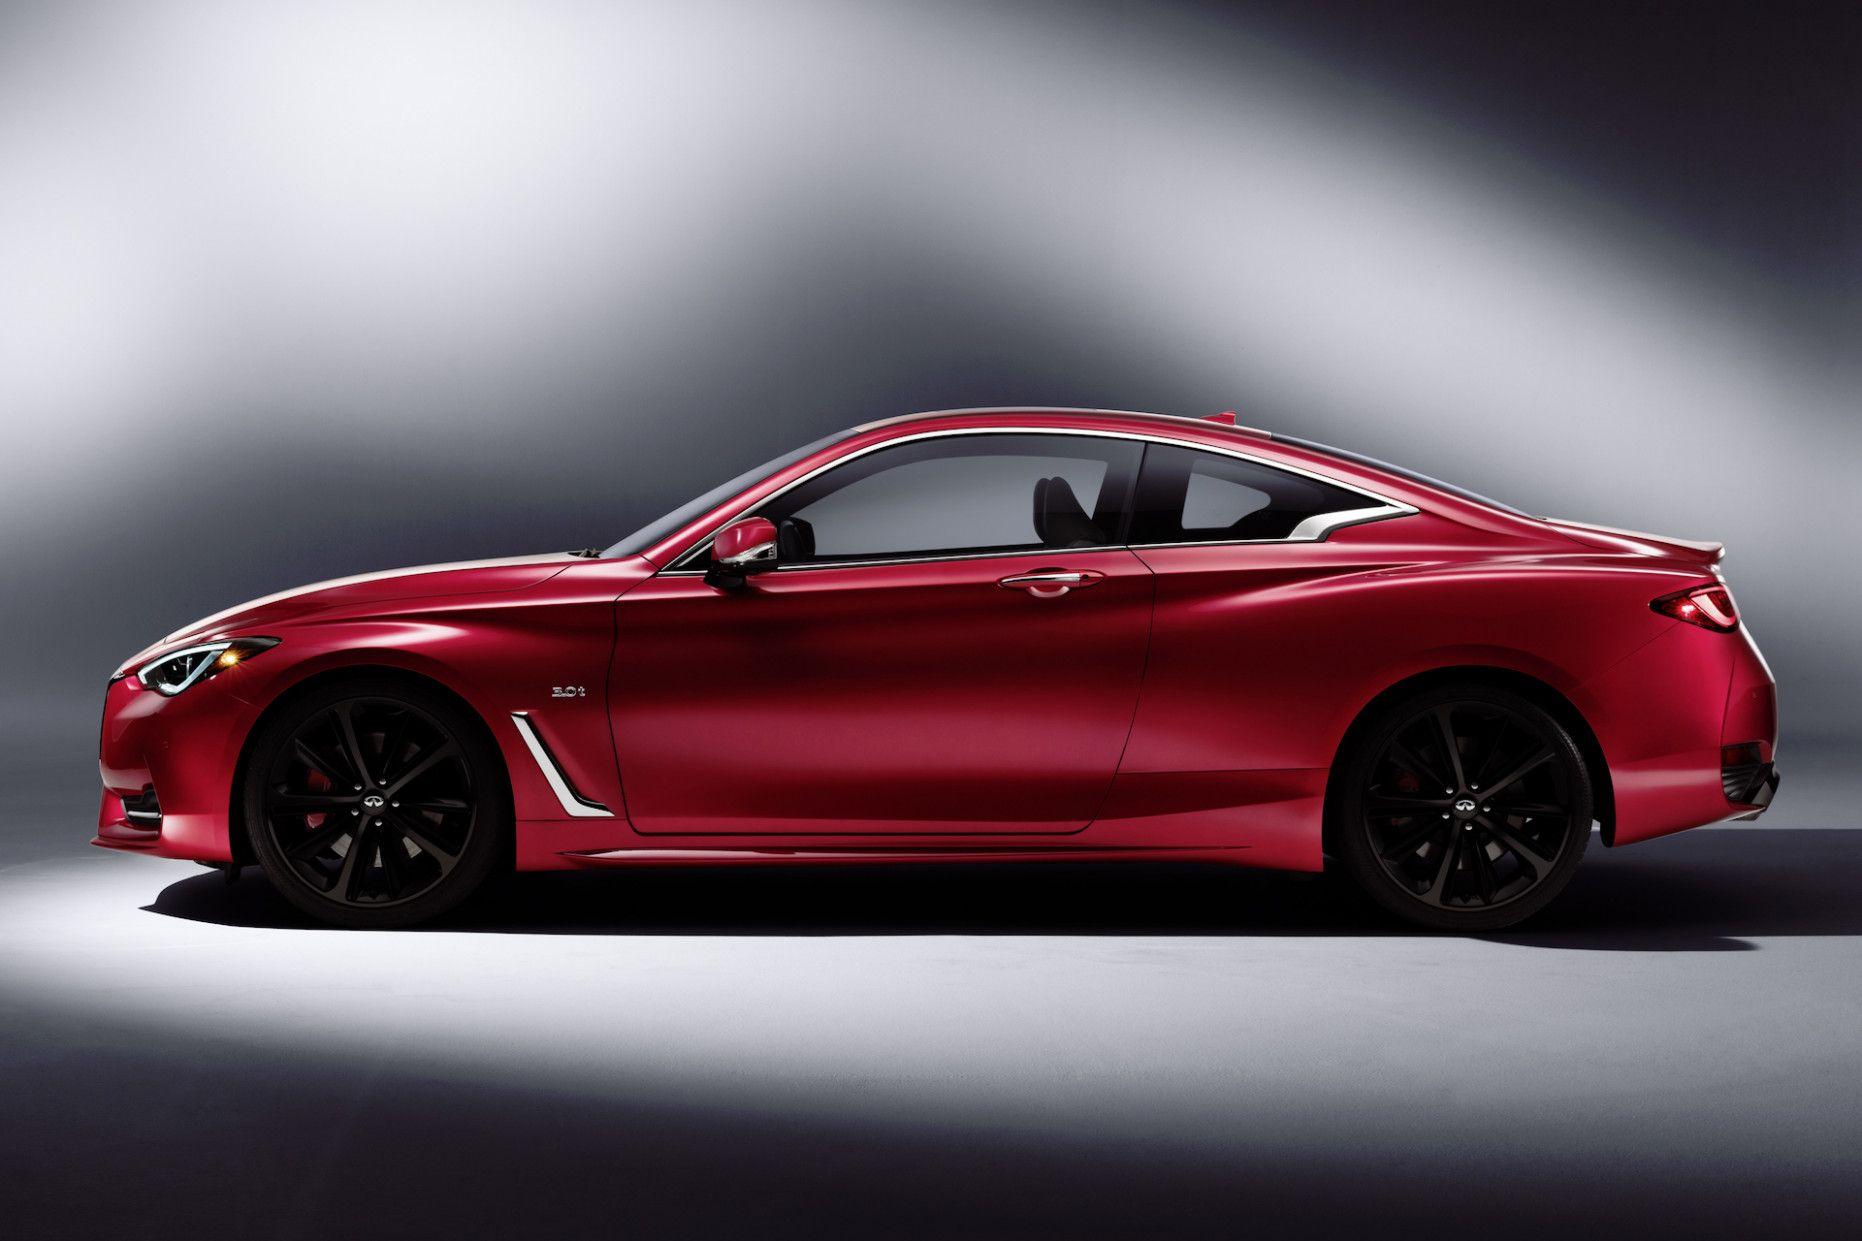 2020 Infiniti G37 Convertible In 2020 Infiniti Infiniti Q50 Sports Car